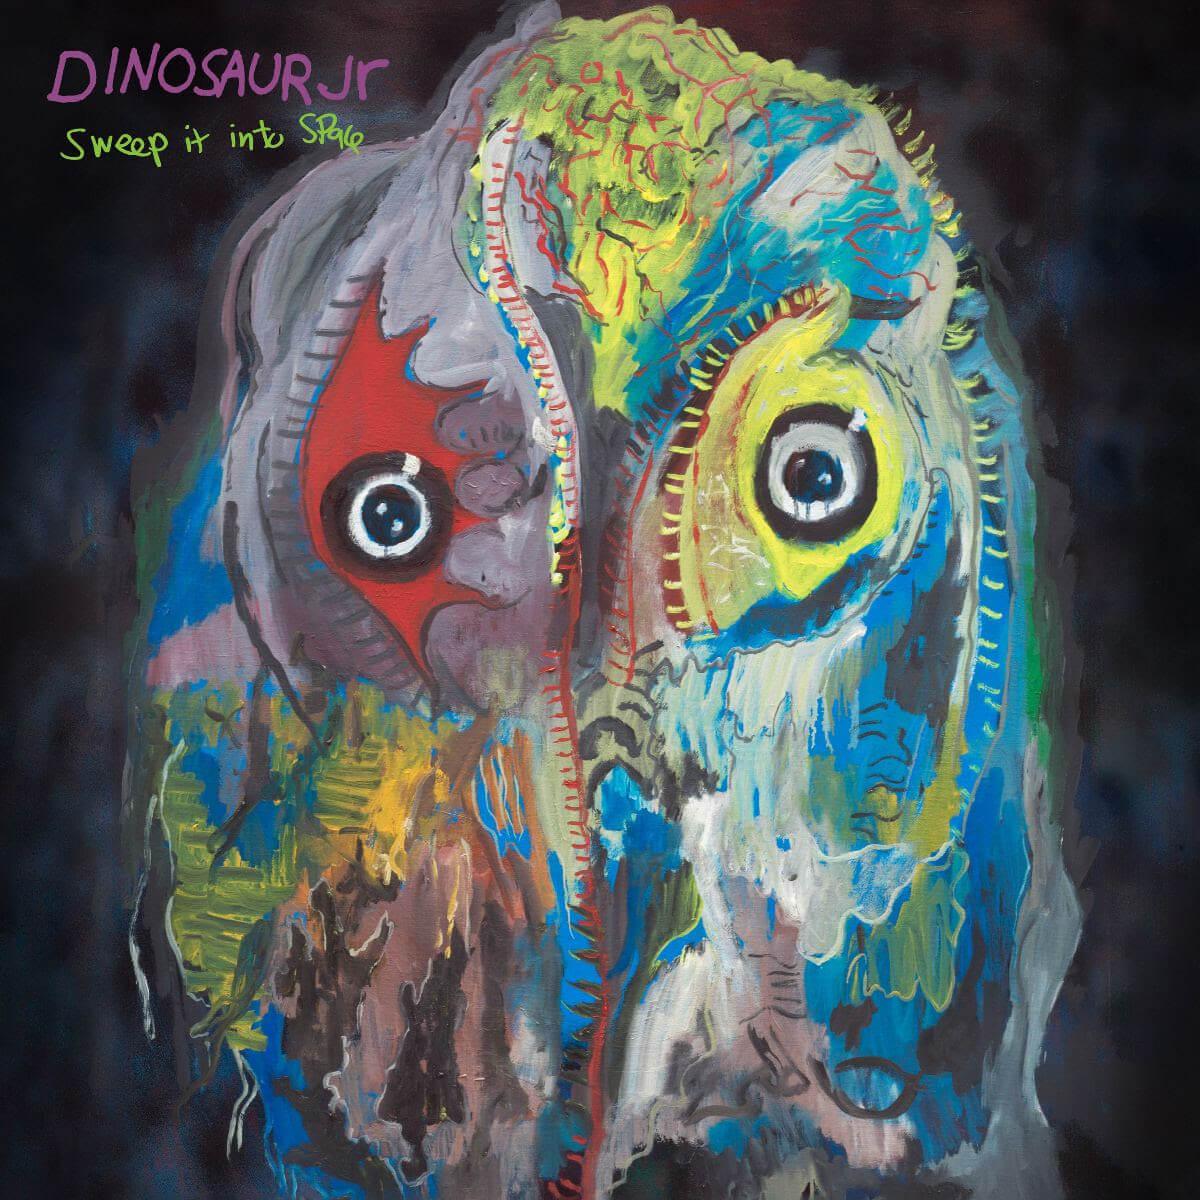 Dinosaur Jr. have announced, their new full full-length Sweep It Into Space, will arrive on April 23rd via Jagjaguwar